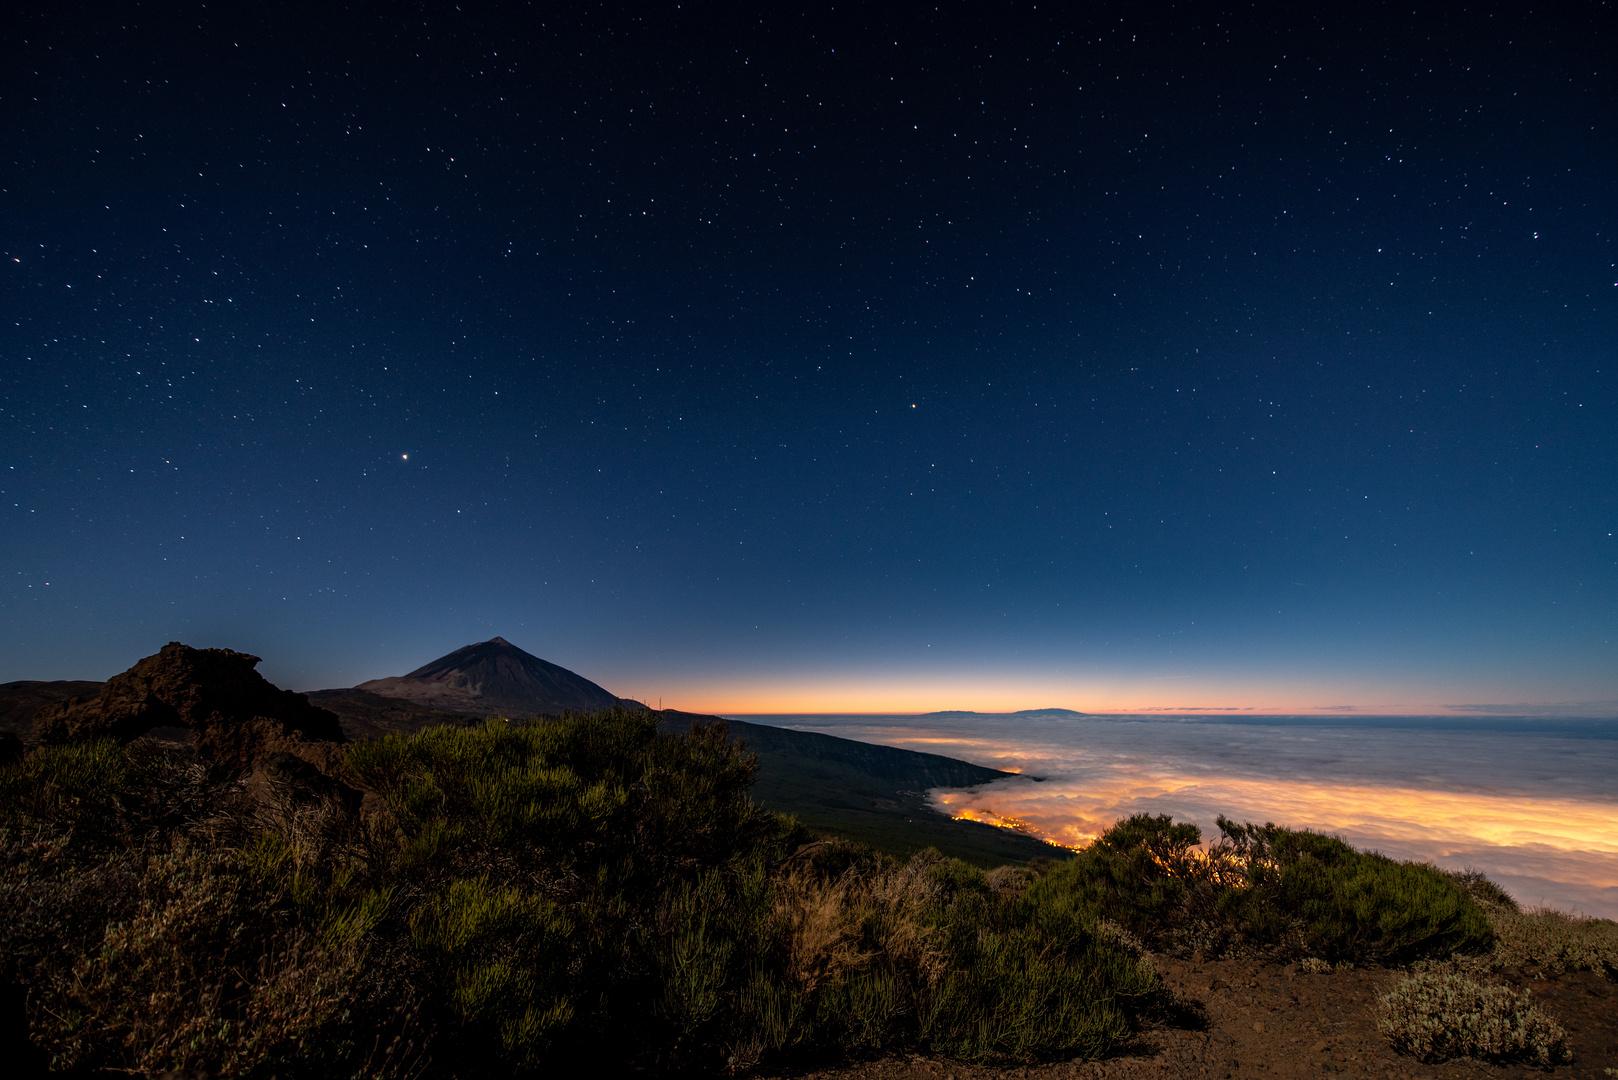 Teide at Night